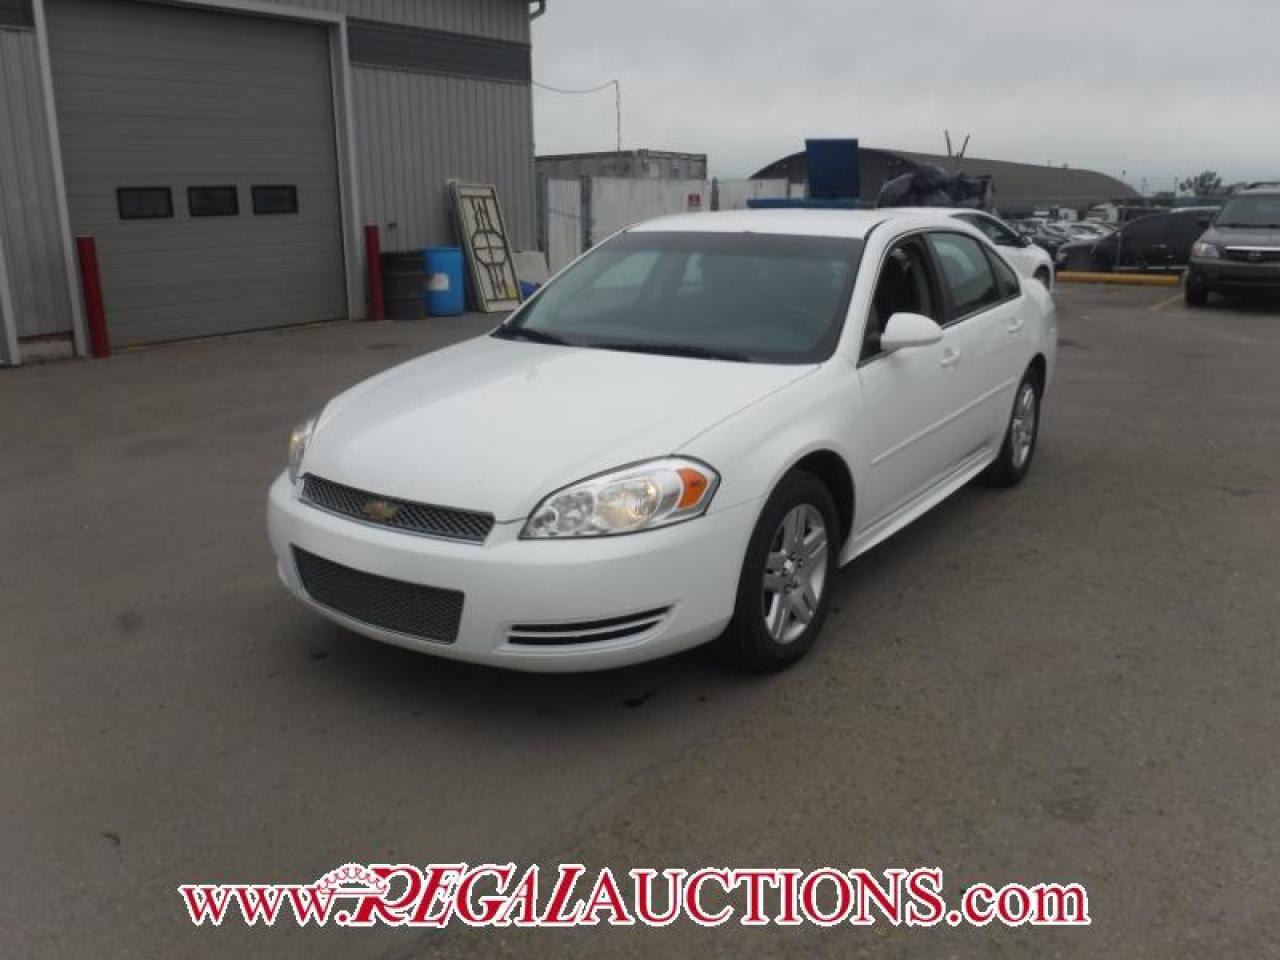 Photo of White 2013 Chevrolet IMPALA LT 4D SEDAN 3.6L